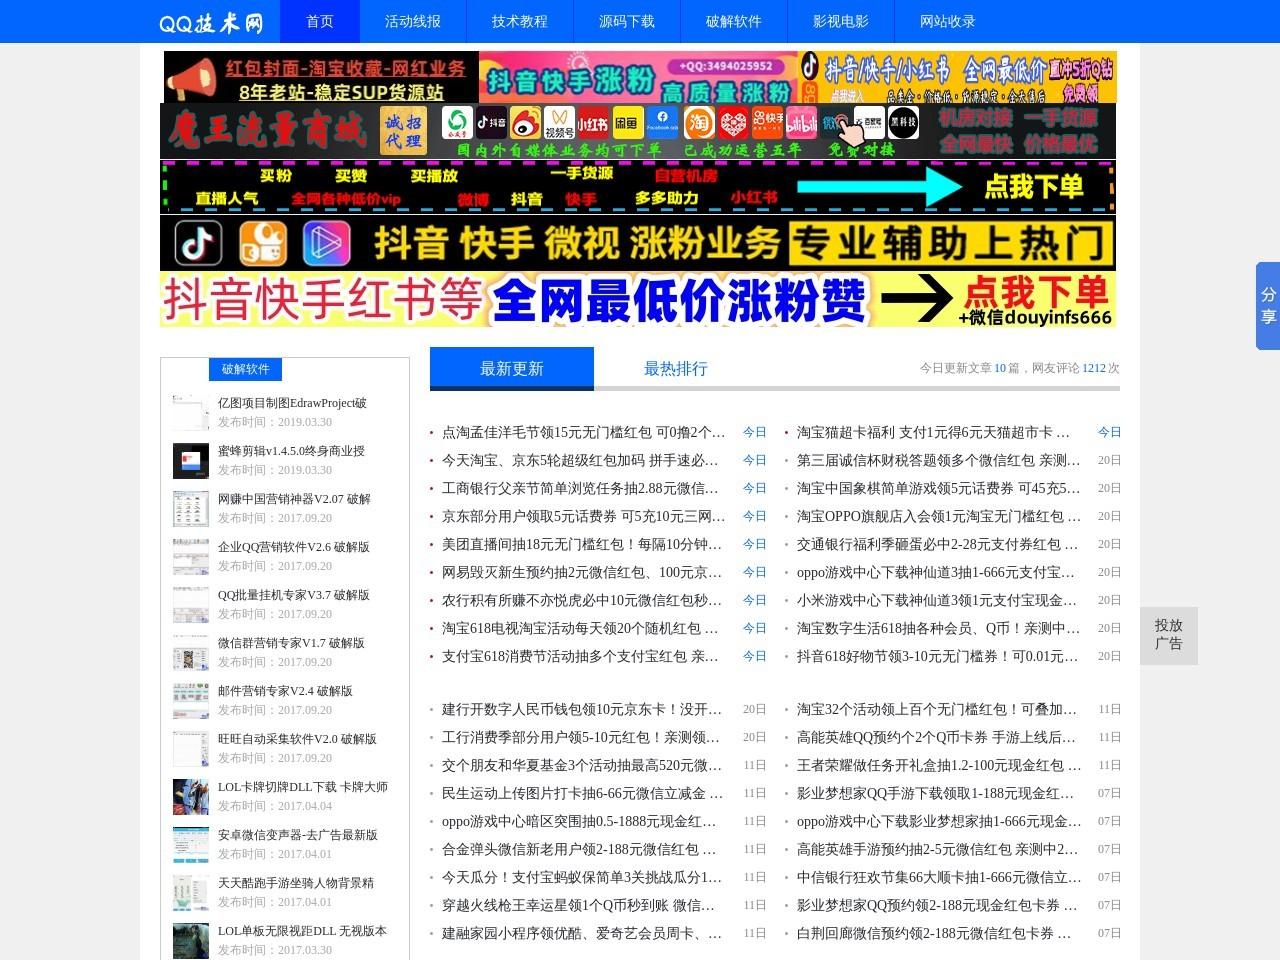 QQ技术网-专注分享QQ资源网站,提供QQ最新技术